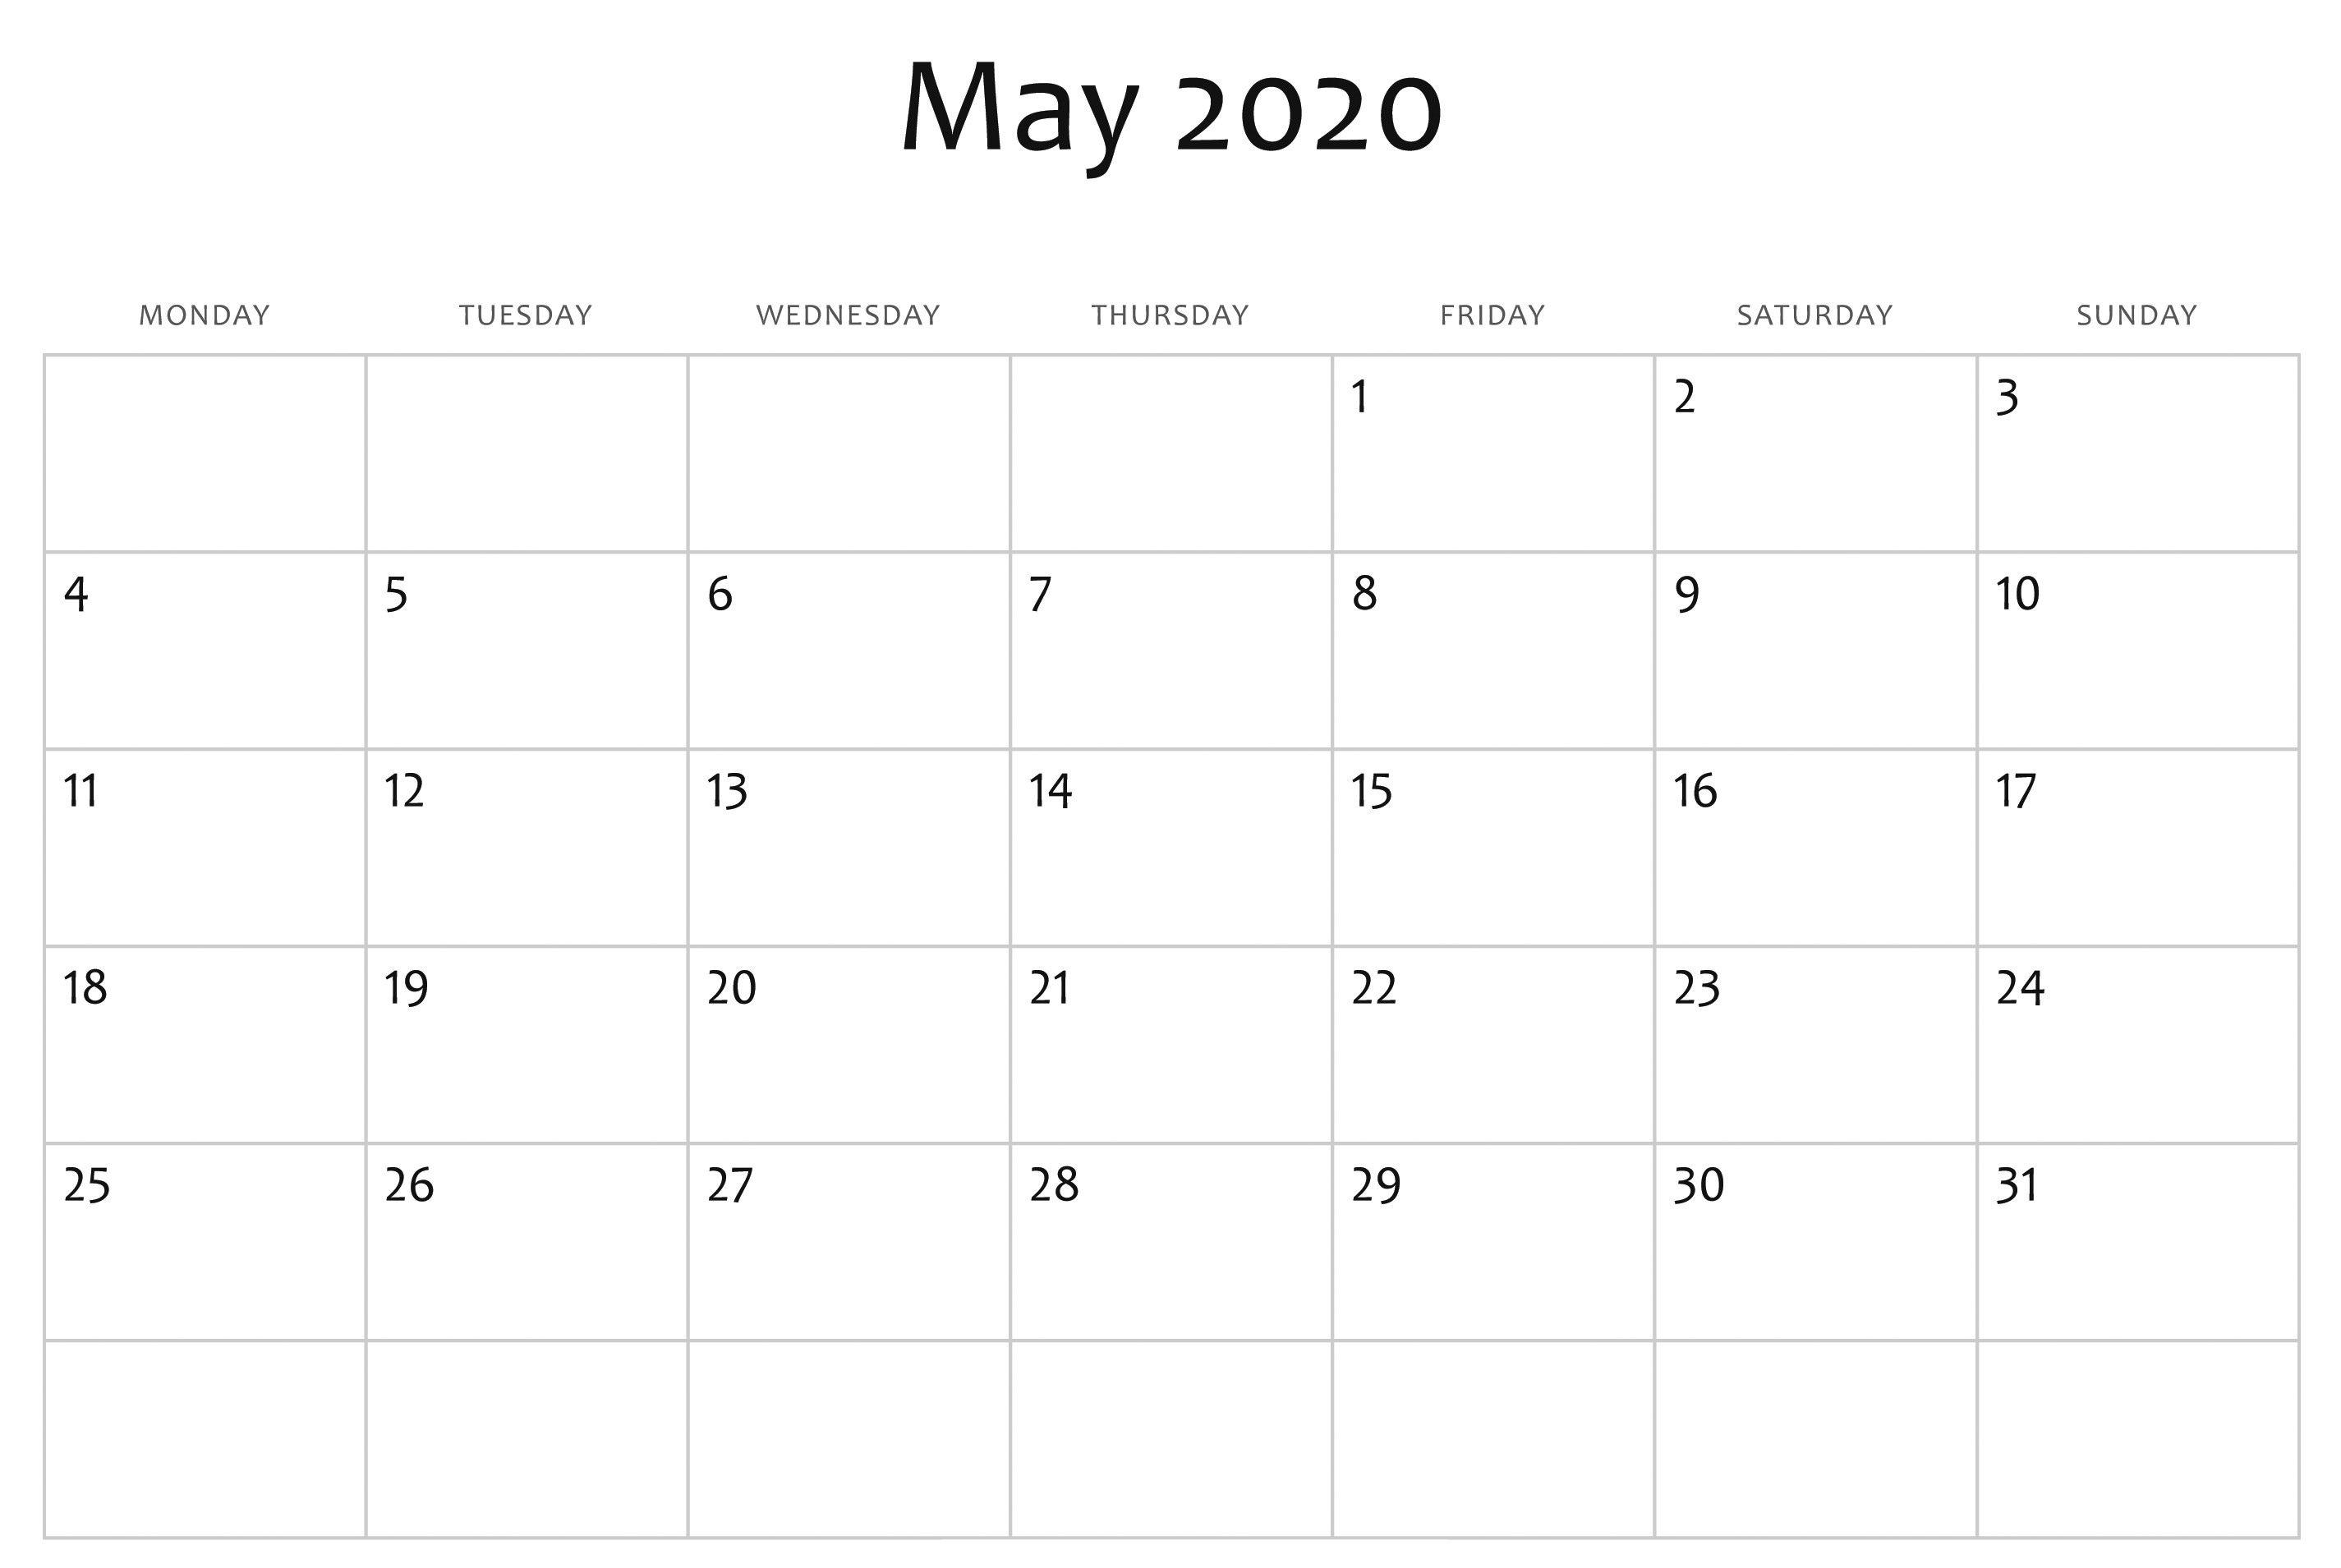 May 2020 Calendar Blank Template | May Calendar Printable